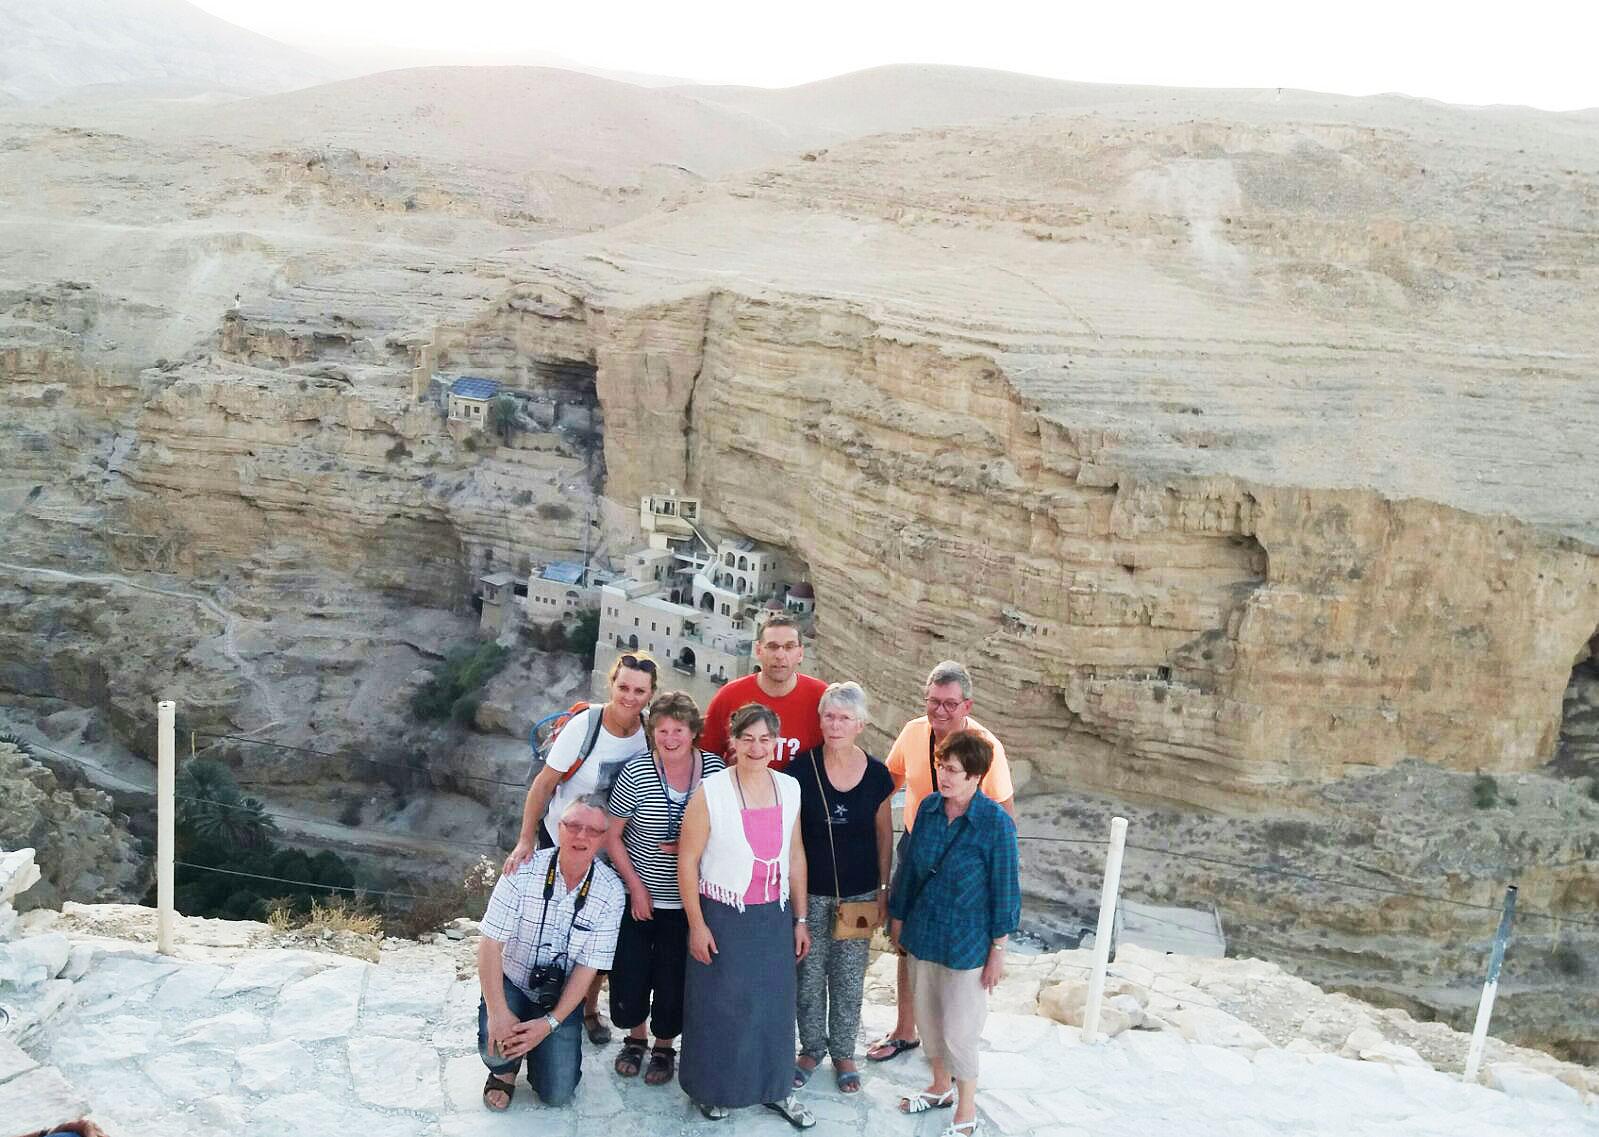 Reise nach Israel 2017: berühmtes Höhlenkloster bei Jerichow